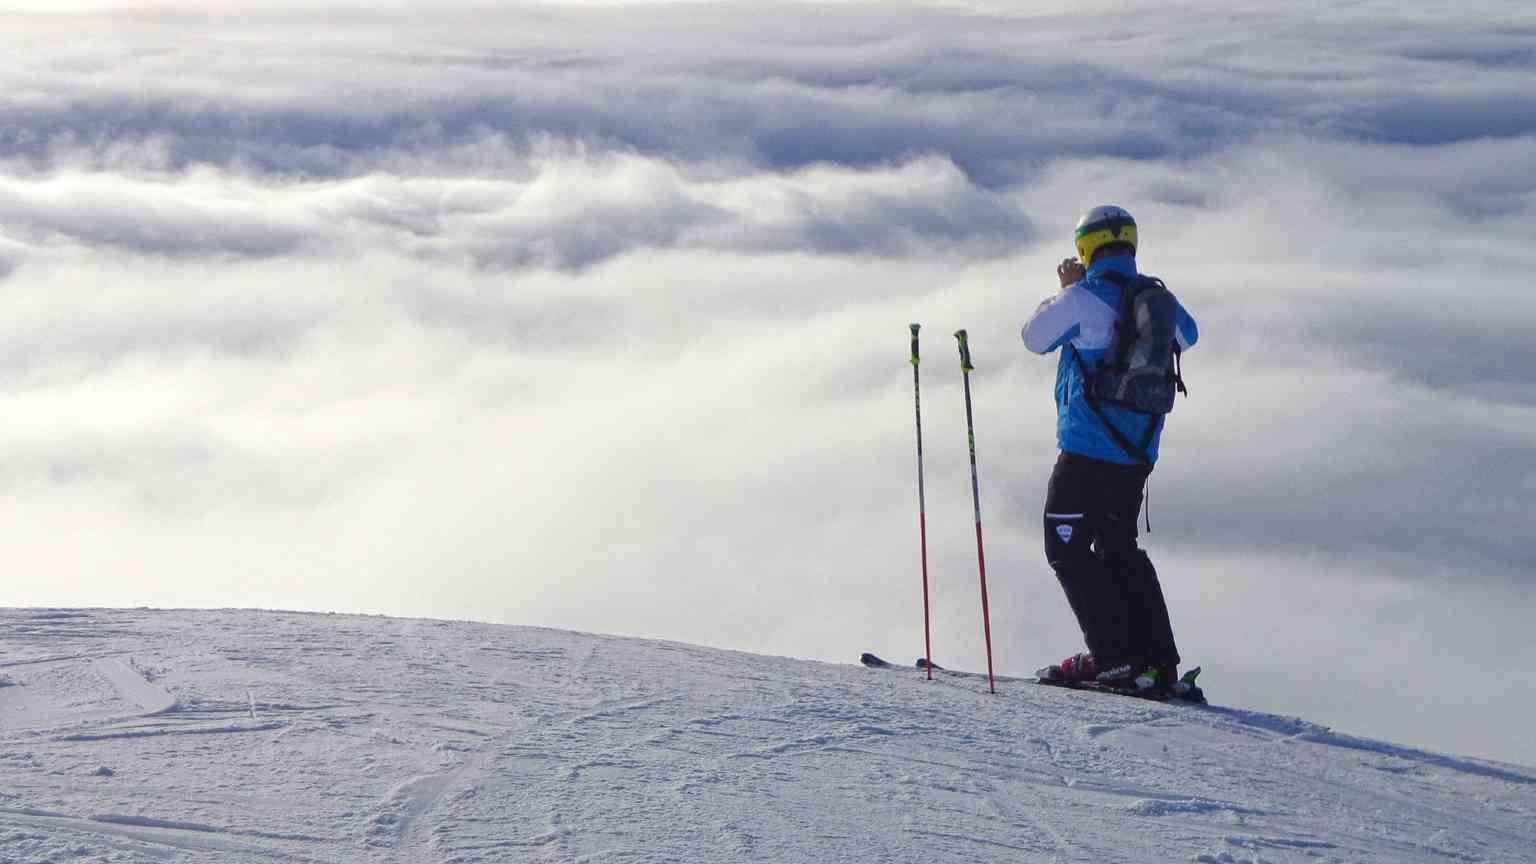 Skier taking a photo